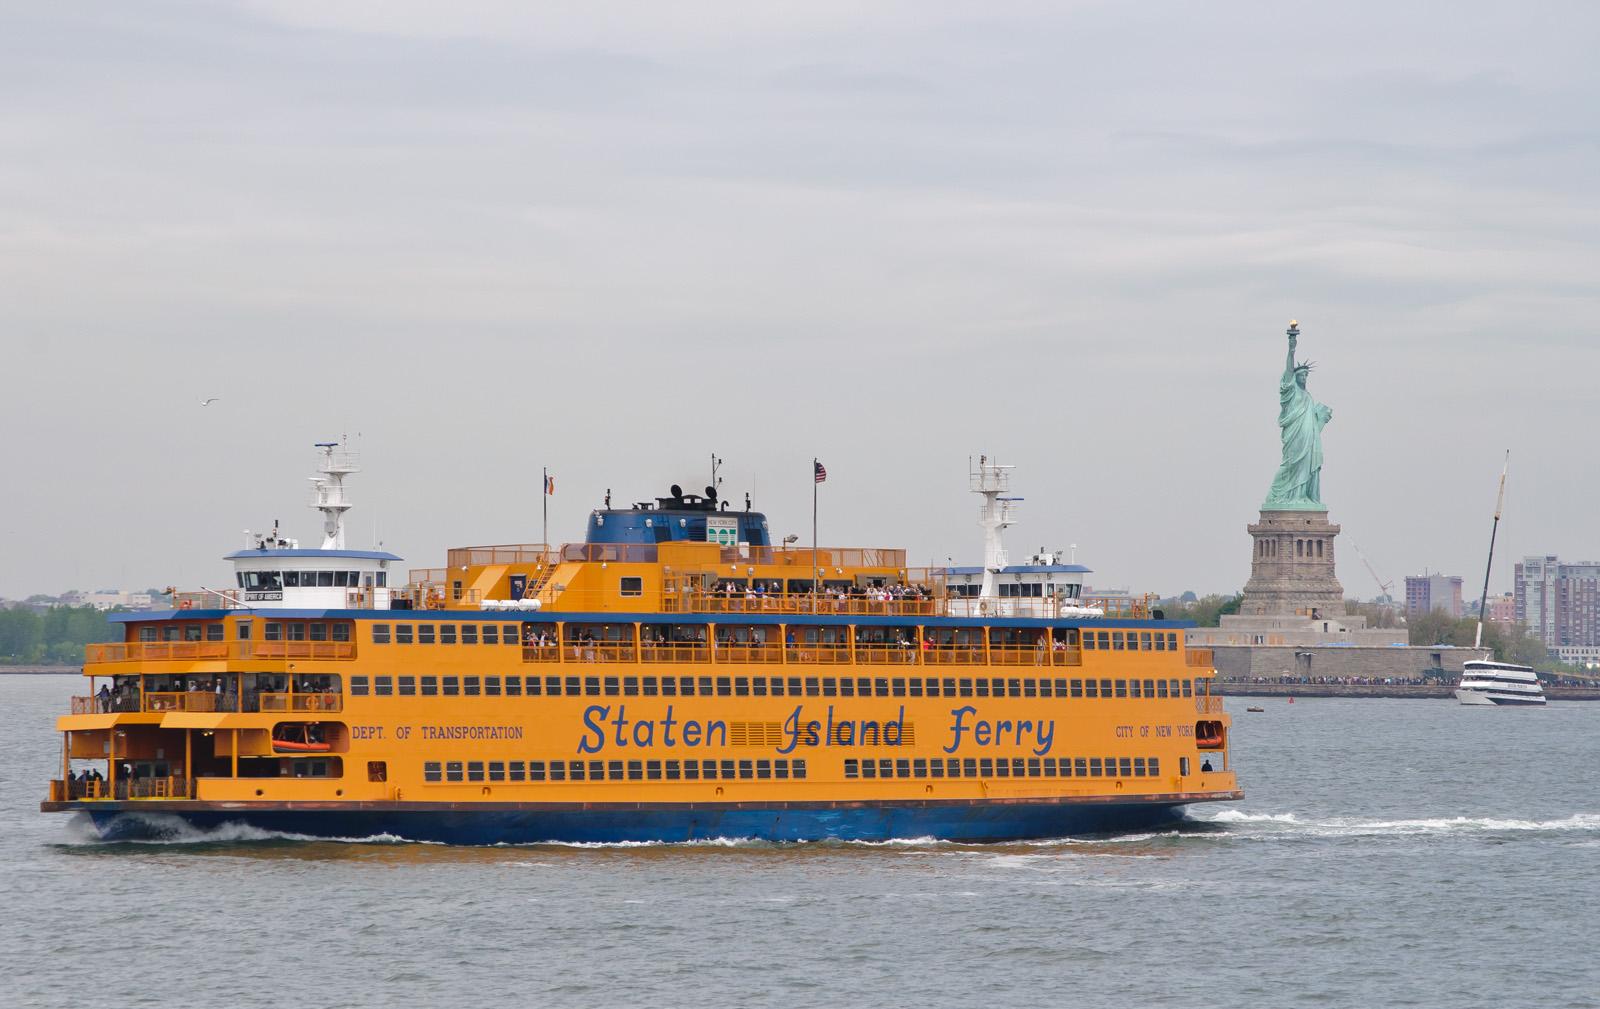 Spirit_of_America_-_Staten_Island_Ferry.